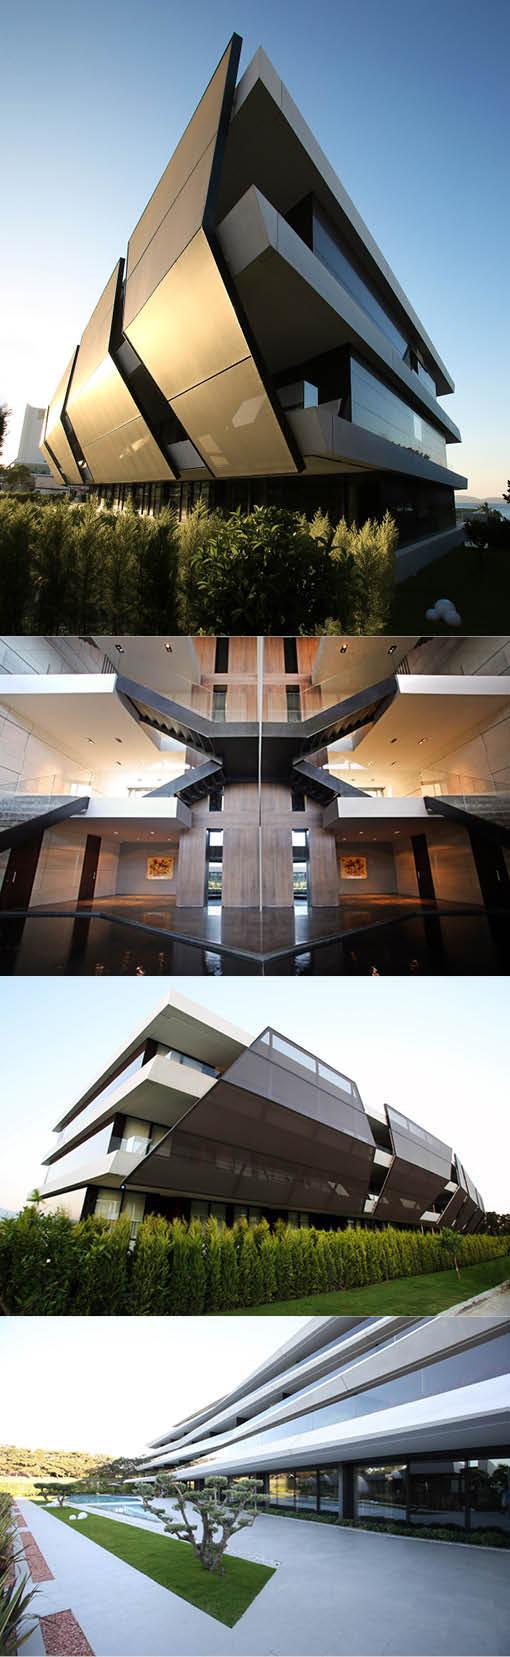 2013 Uras x Dilekci - Mi'Costa Hotel Residences / Boyalik Turkey / steel concrete / horeca / white black